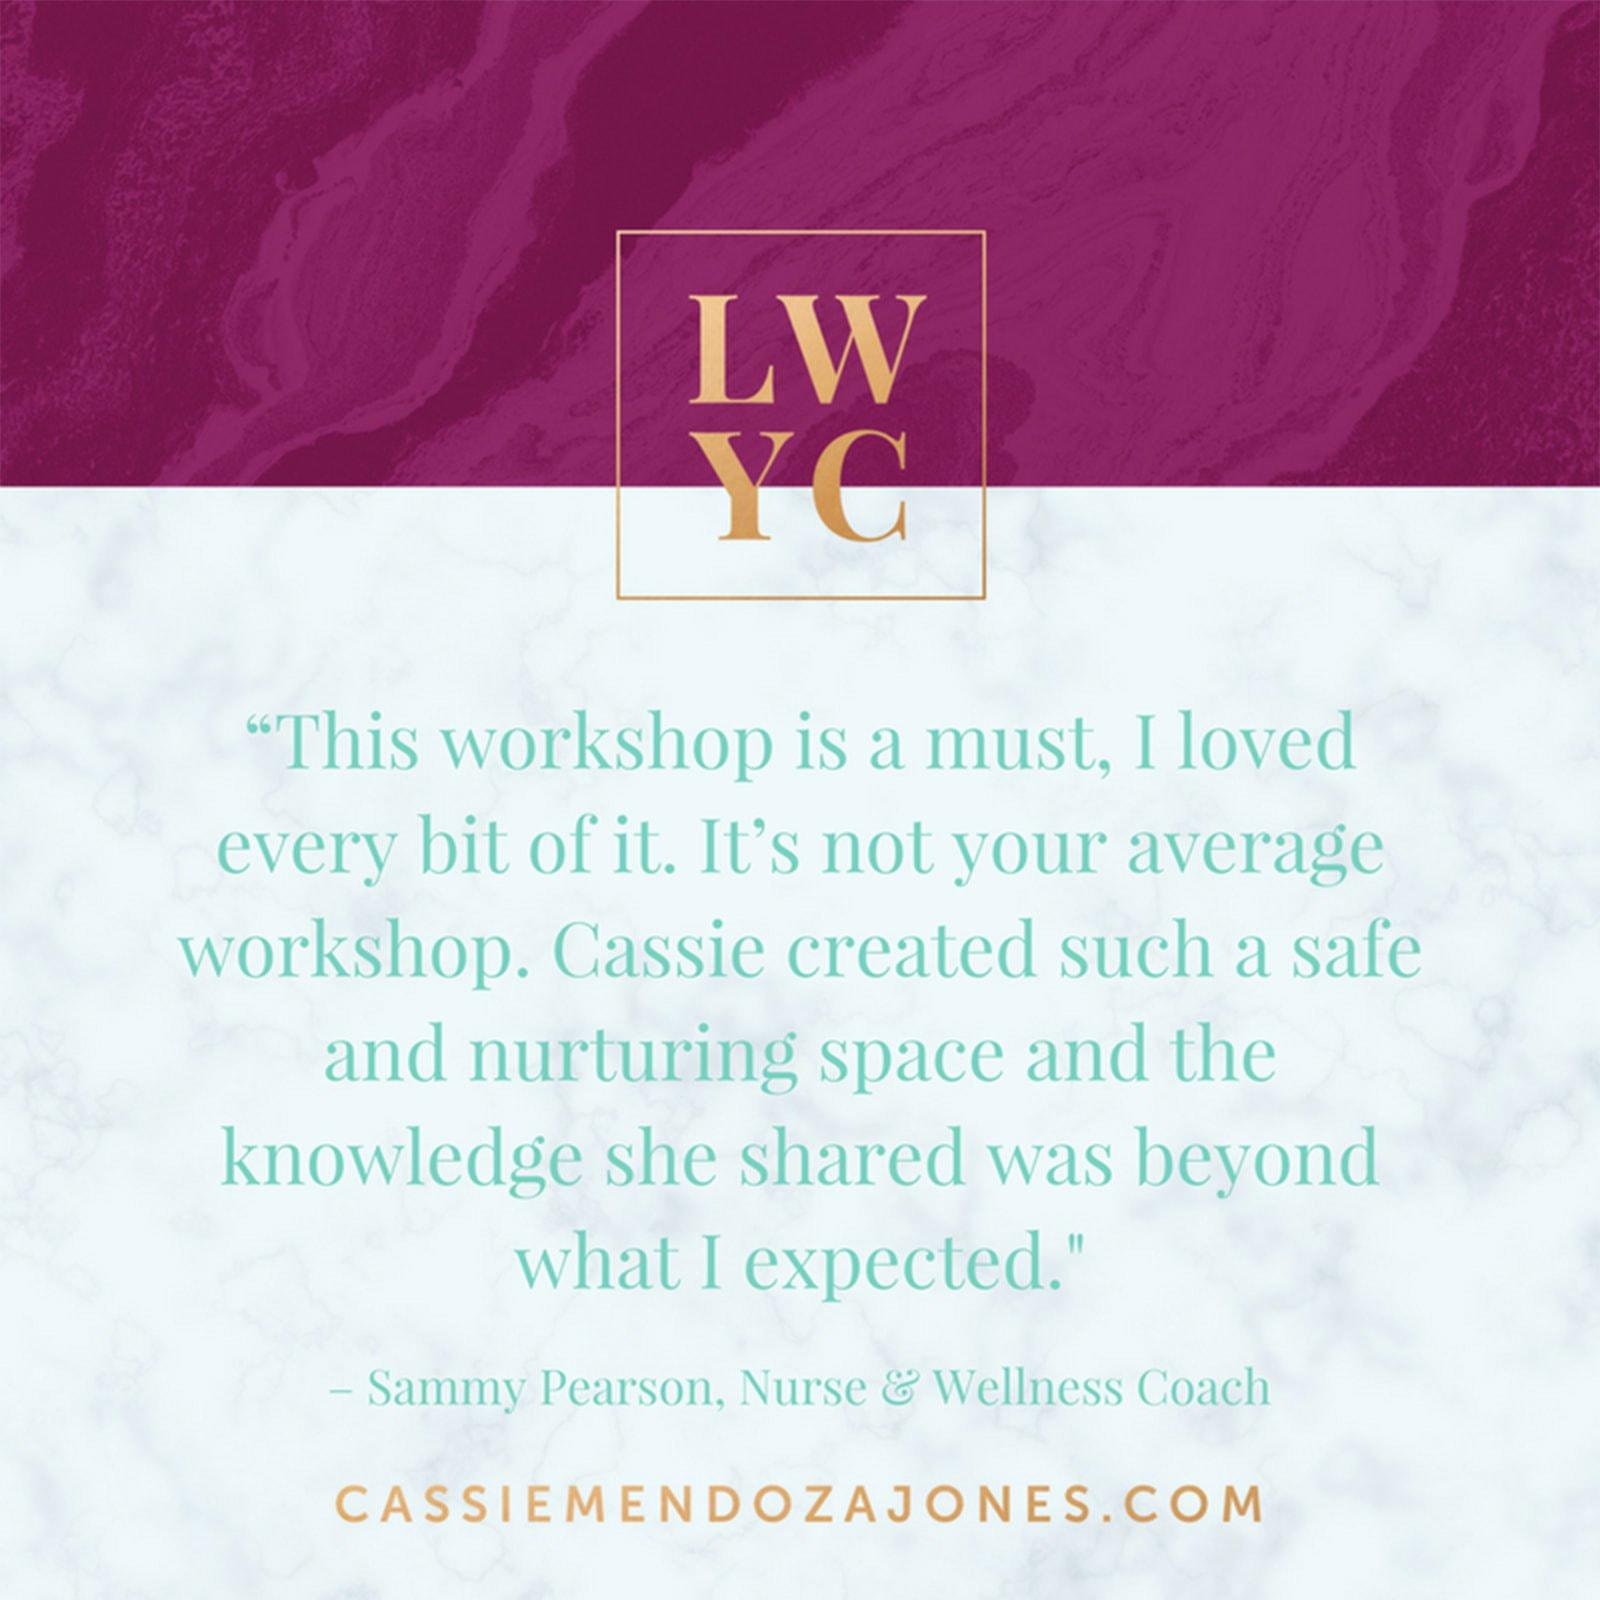 cassie-mendoza-jones-testimonial